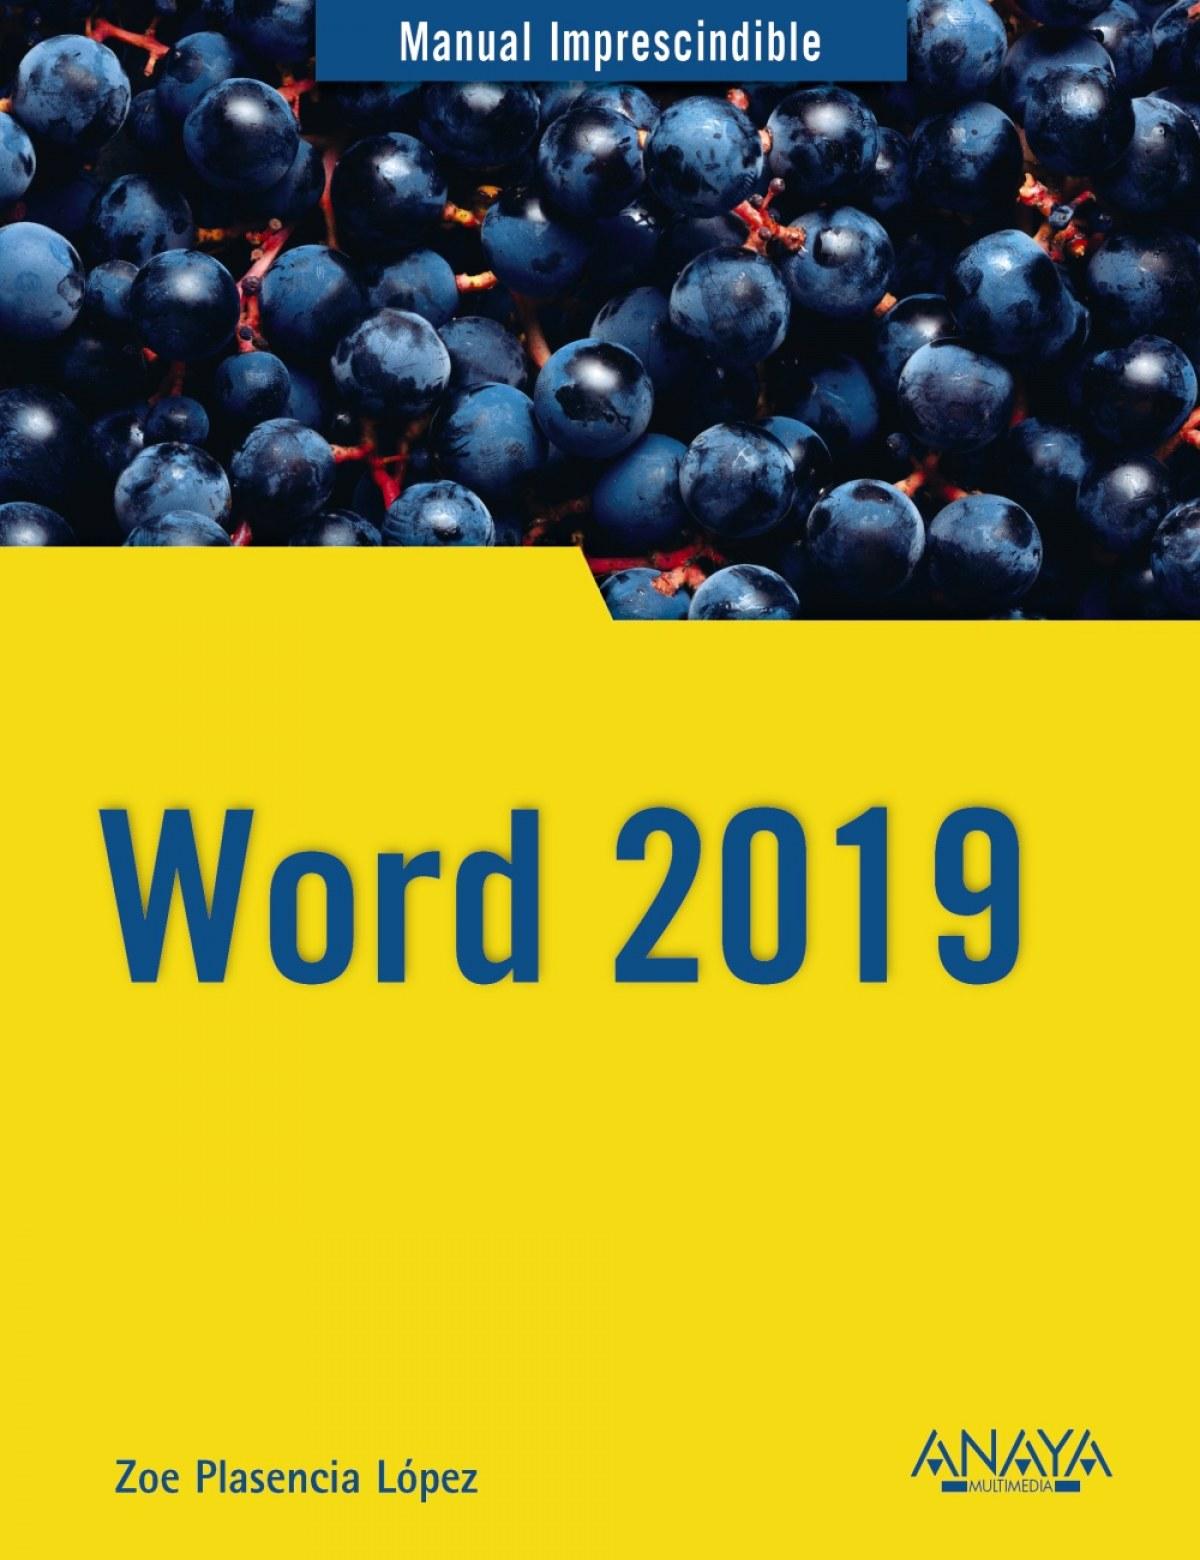 WORD 2019 9788441541146